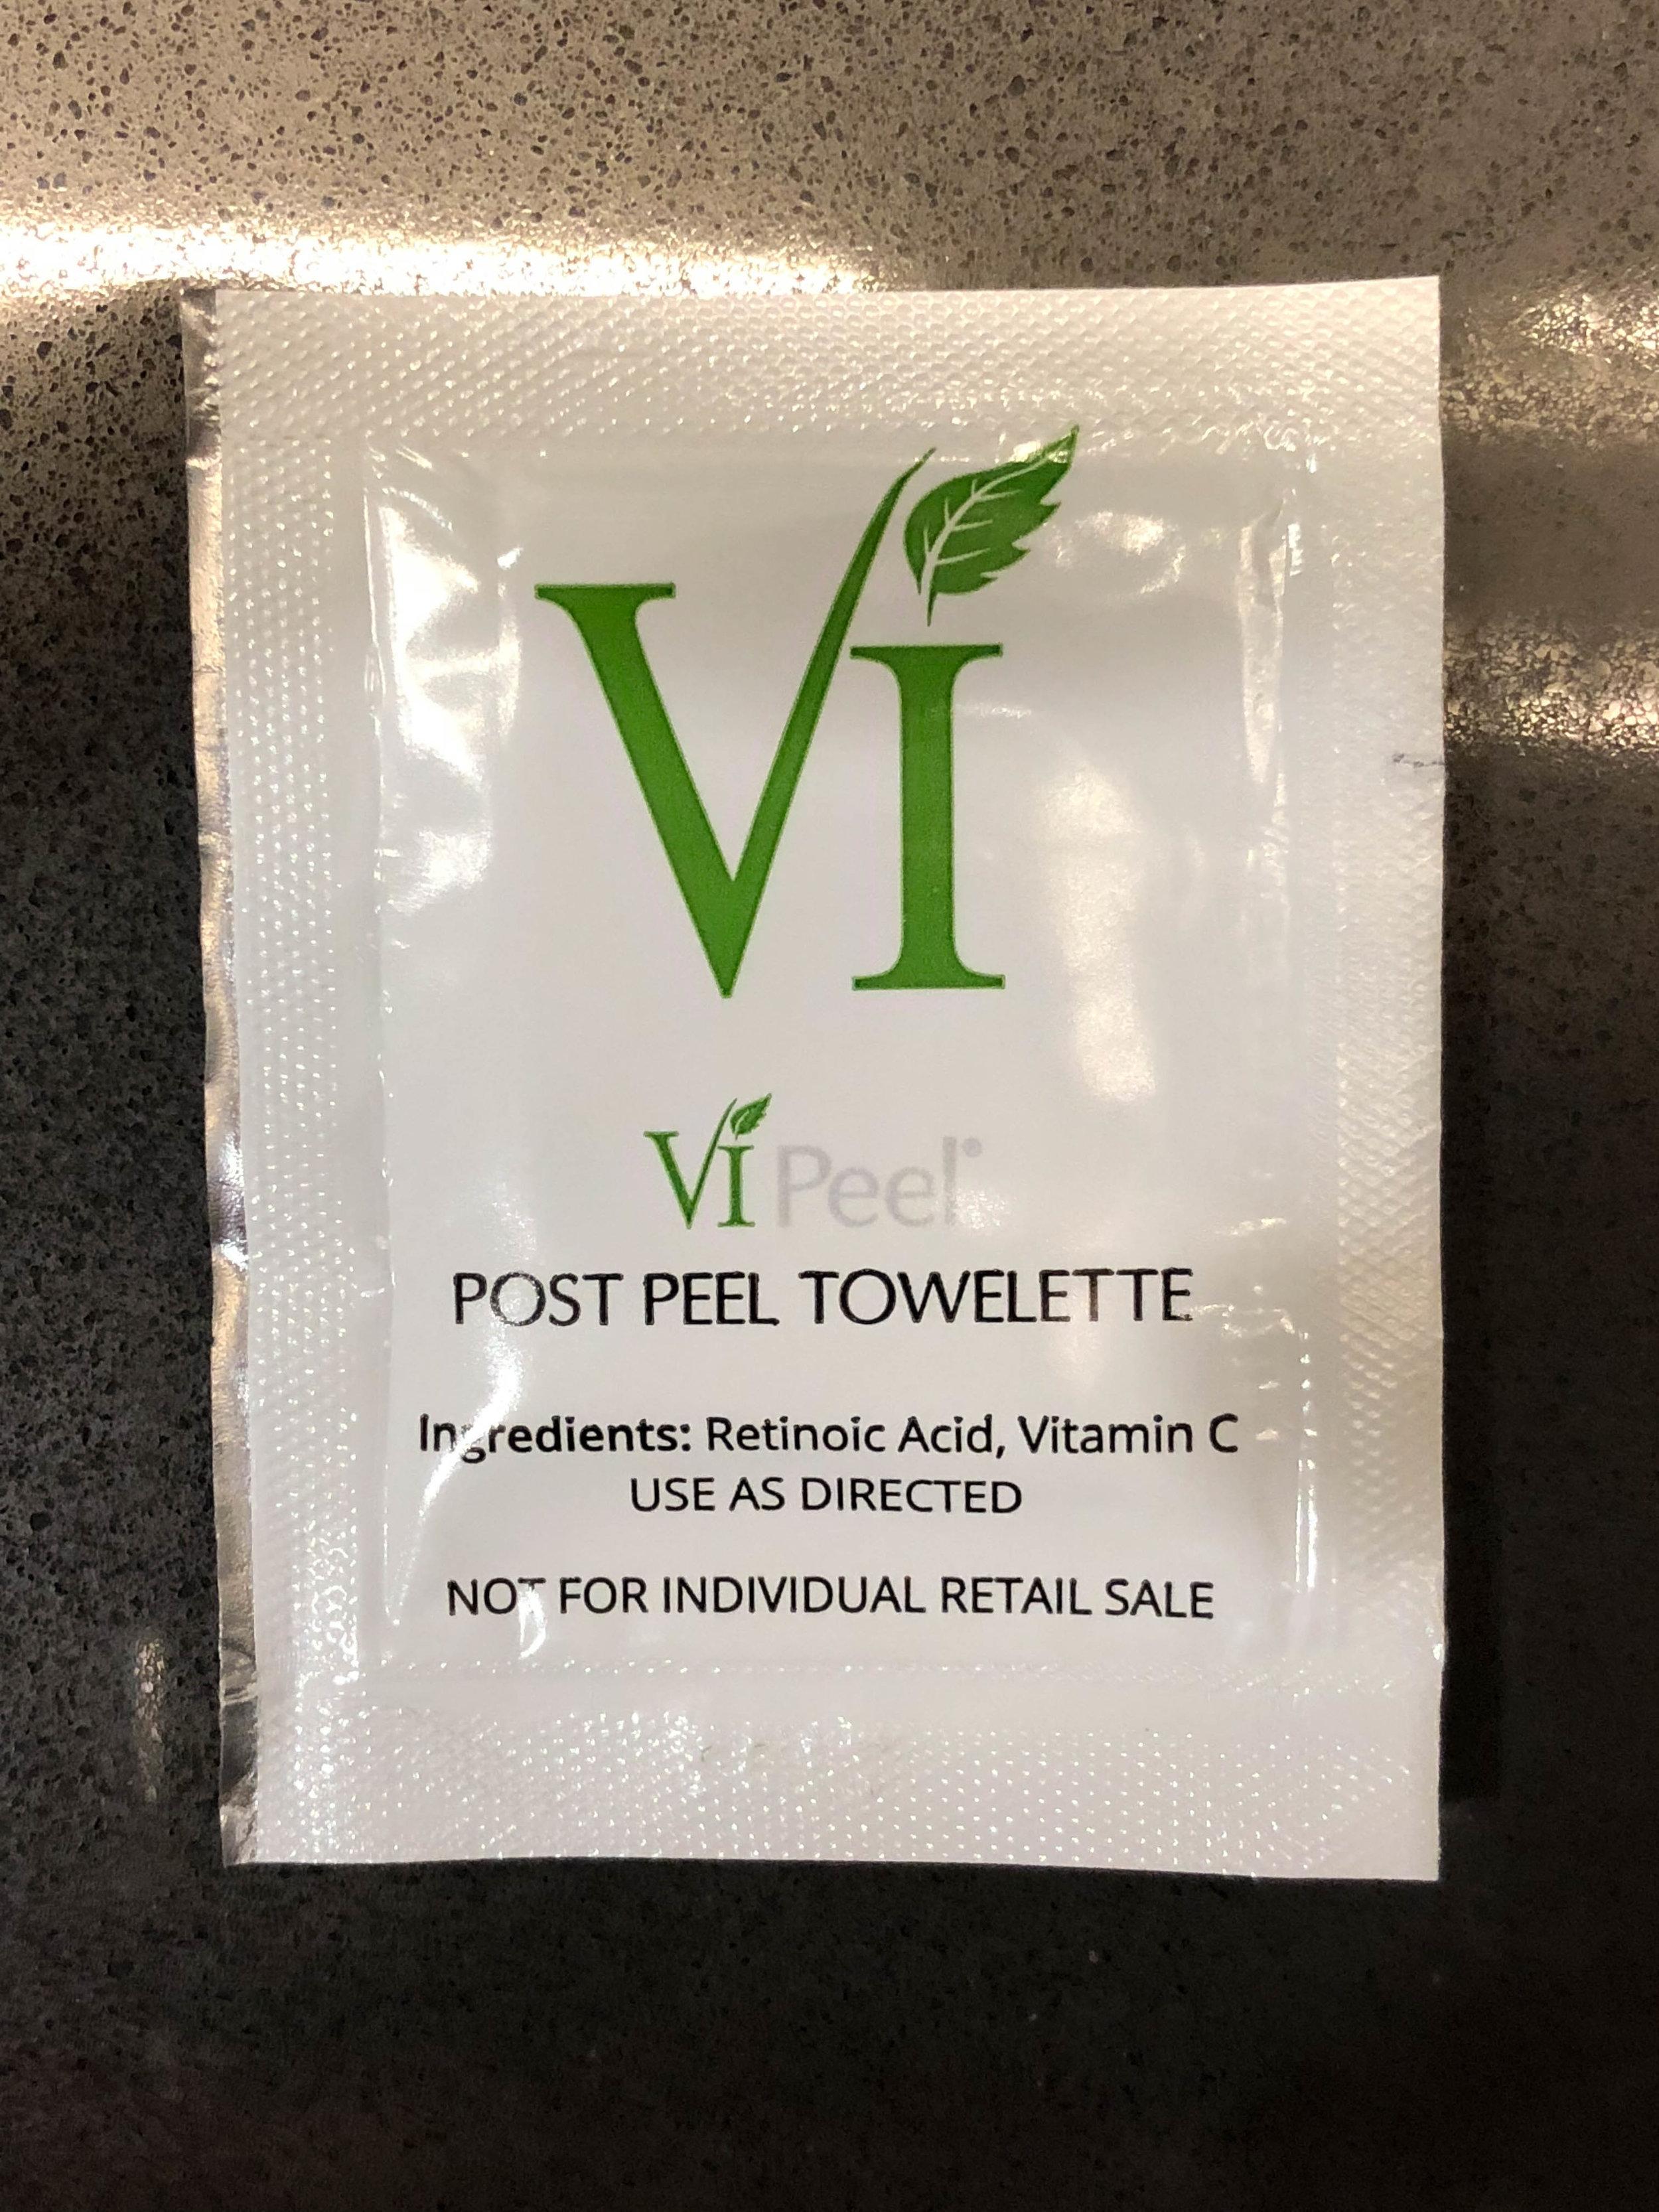 Vi Peel towlette wondrous abyss (1 of 1).jpg